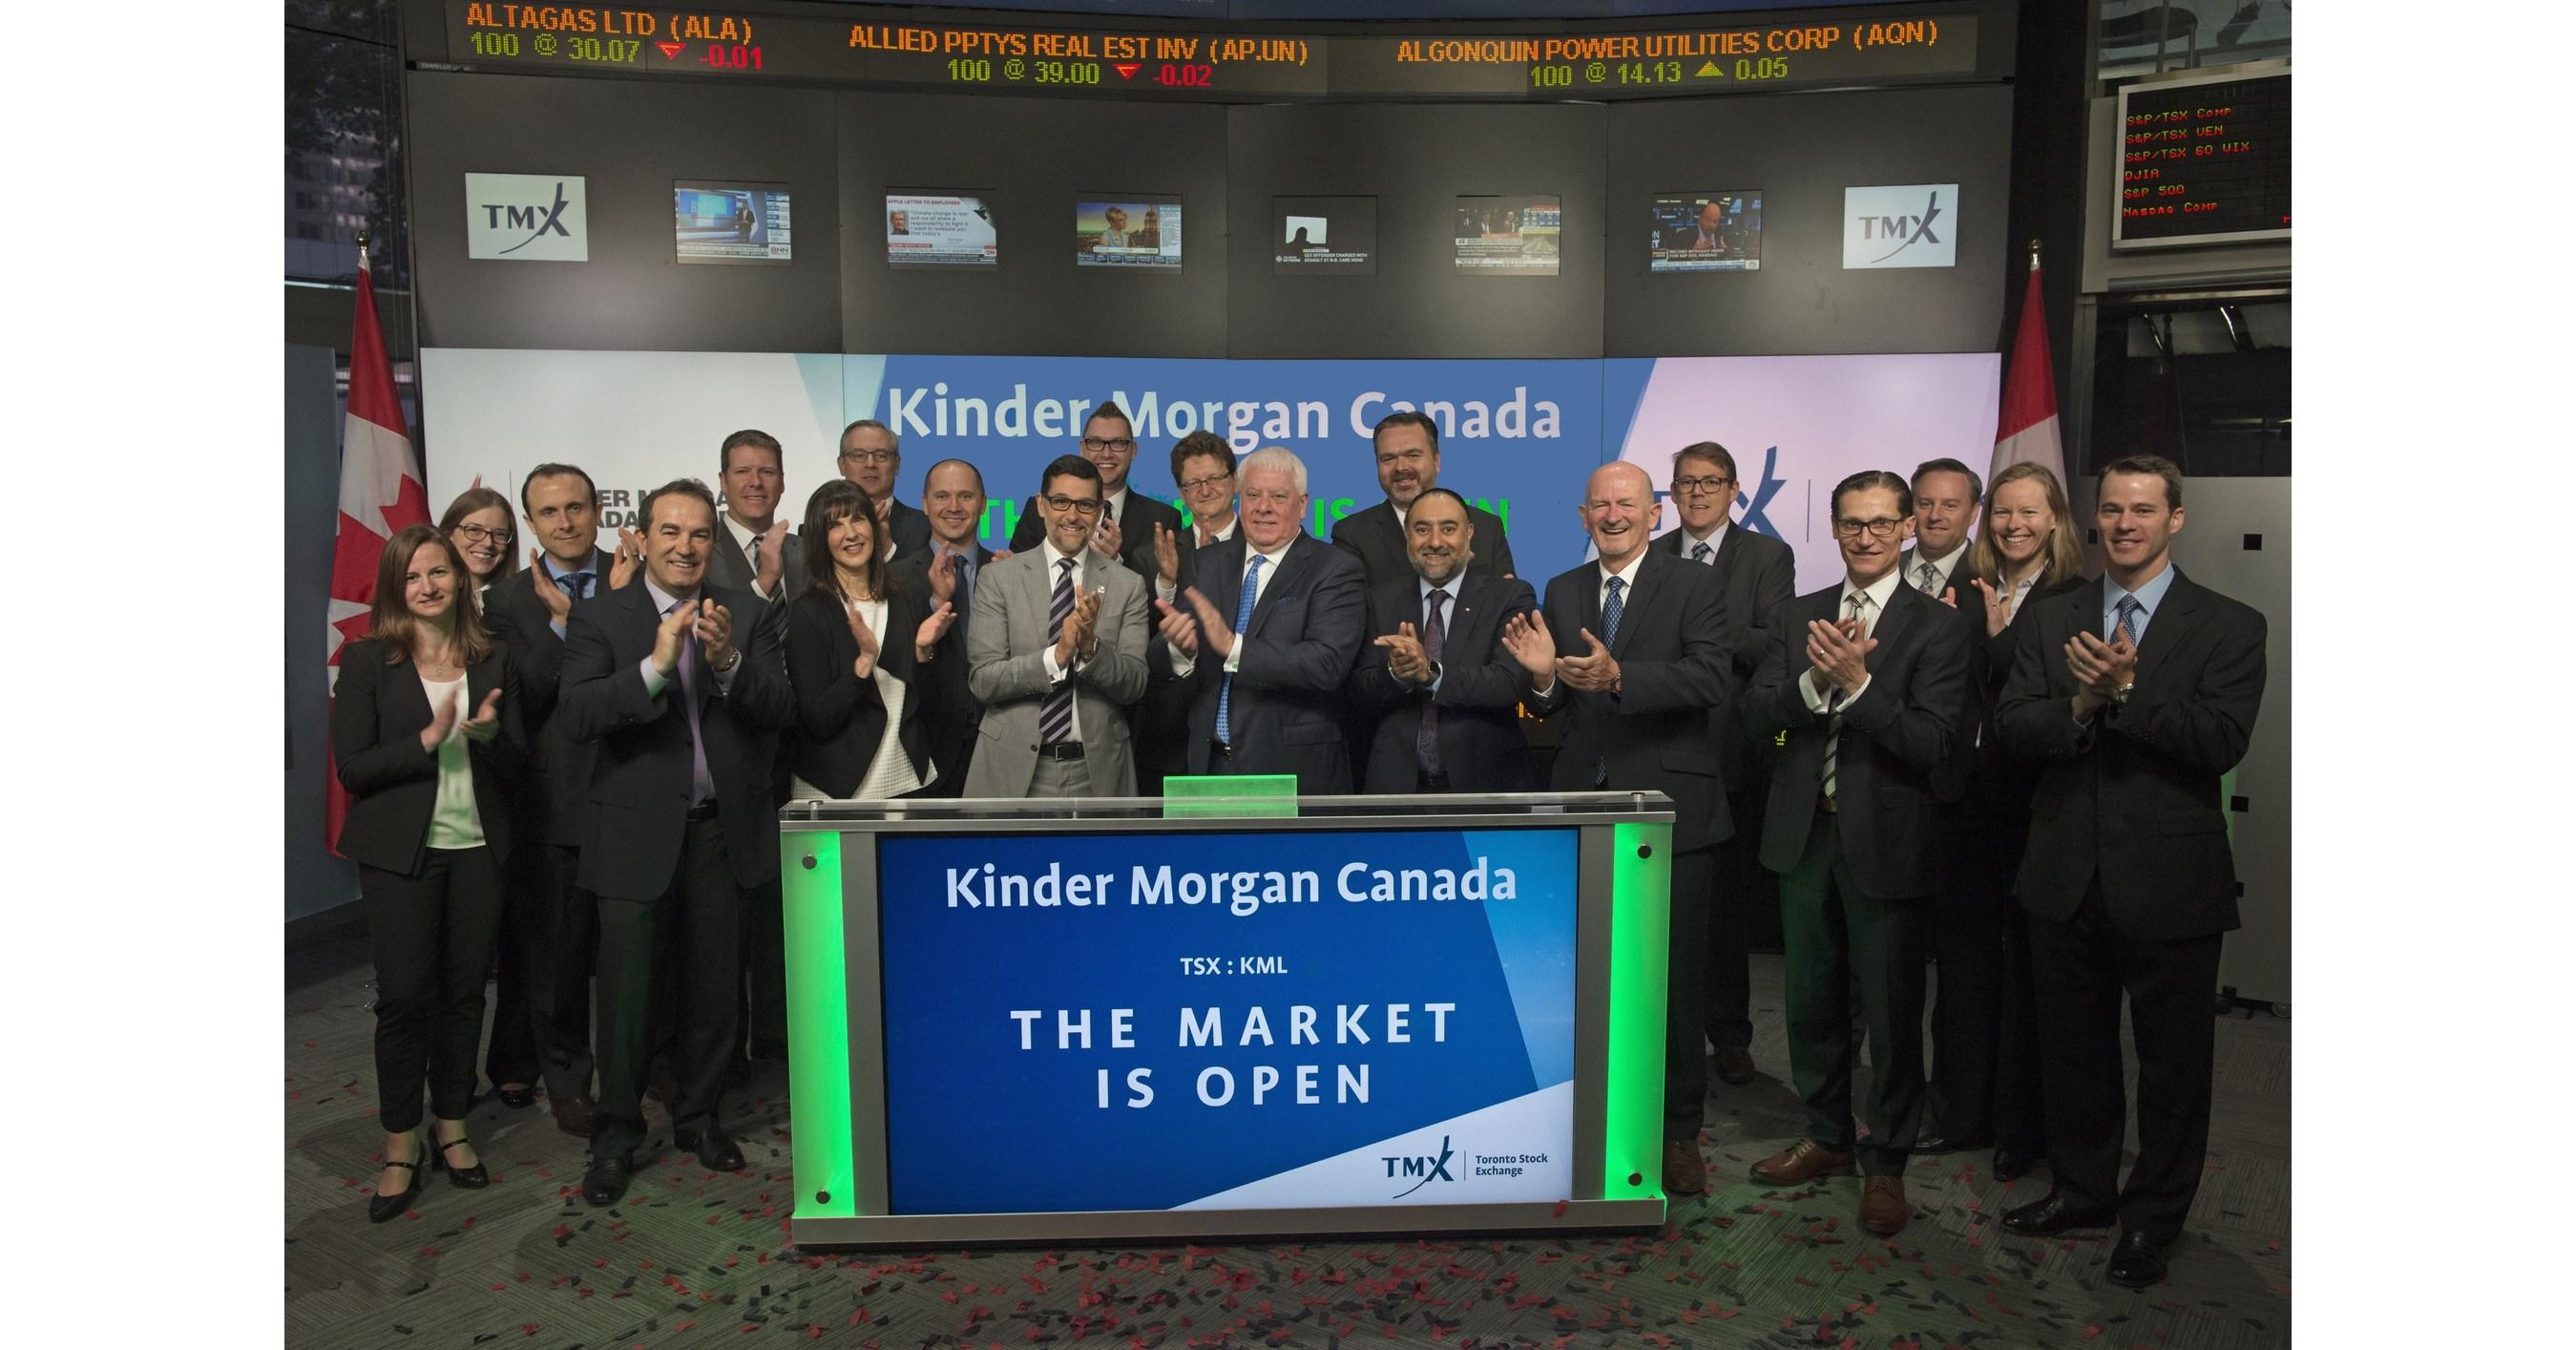 Kinder Morgan Stock Quote Toronto Stock Exchange Welcomes Kinder Morgan Canada